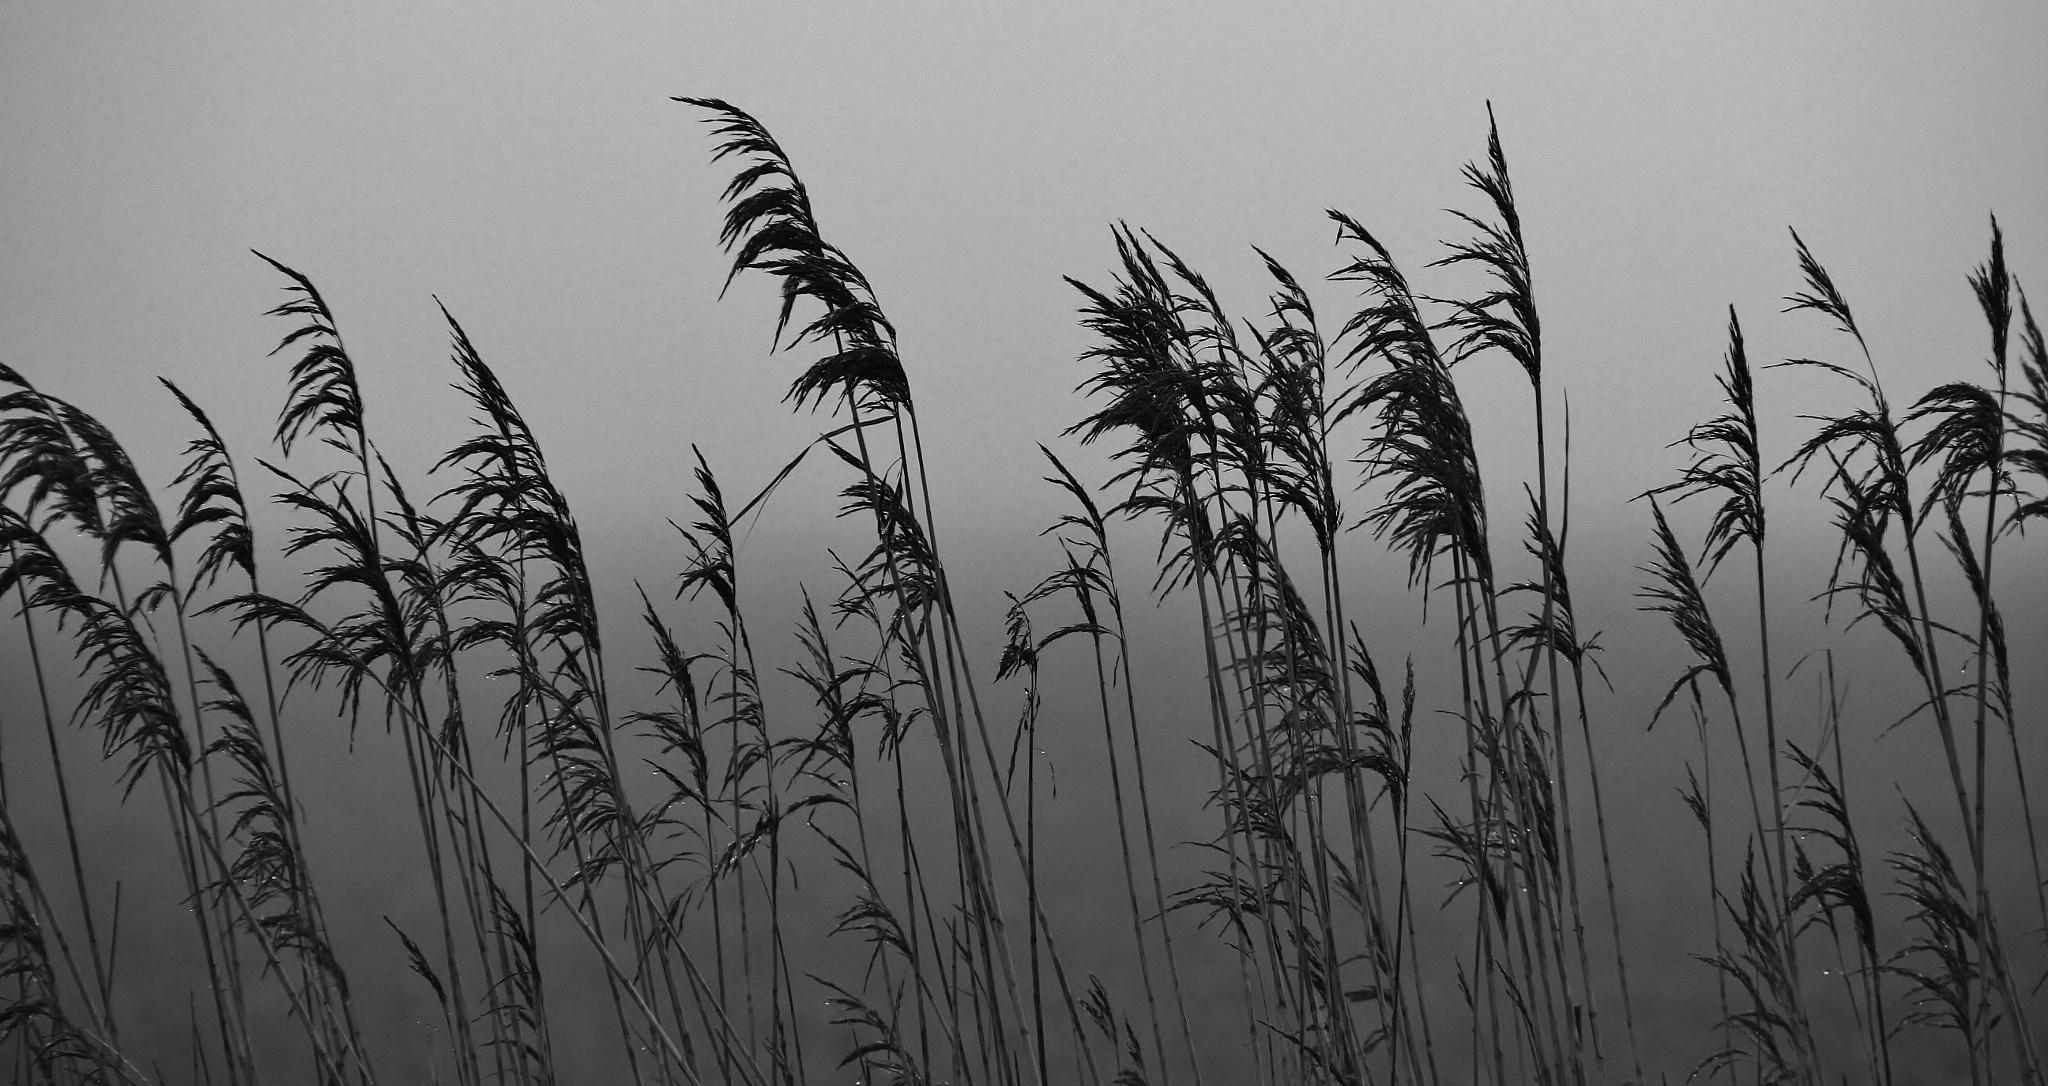 Rain in the Rushes by David N Cath Pinkett